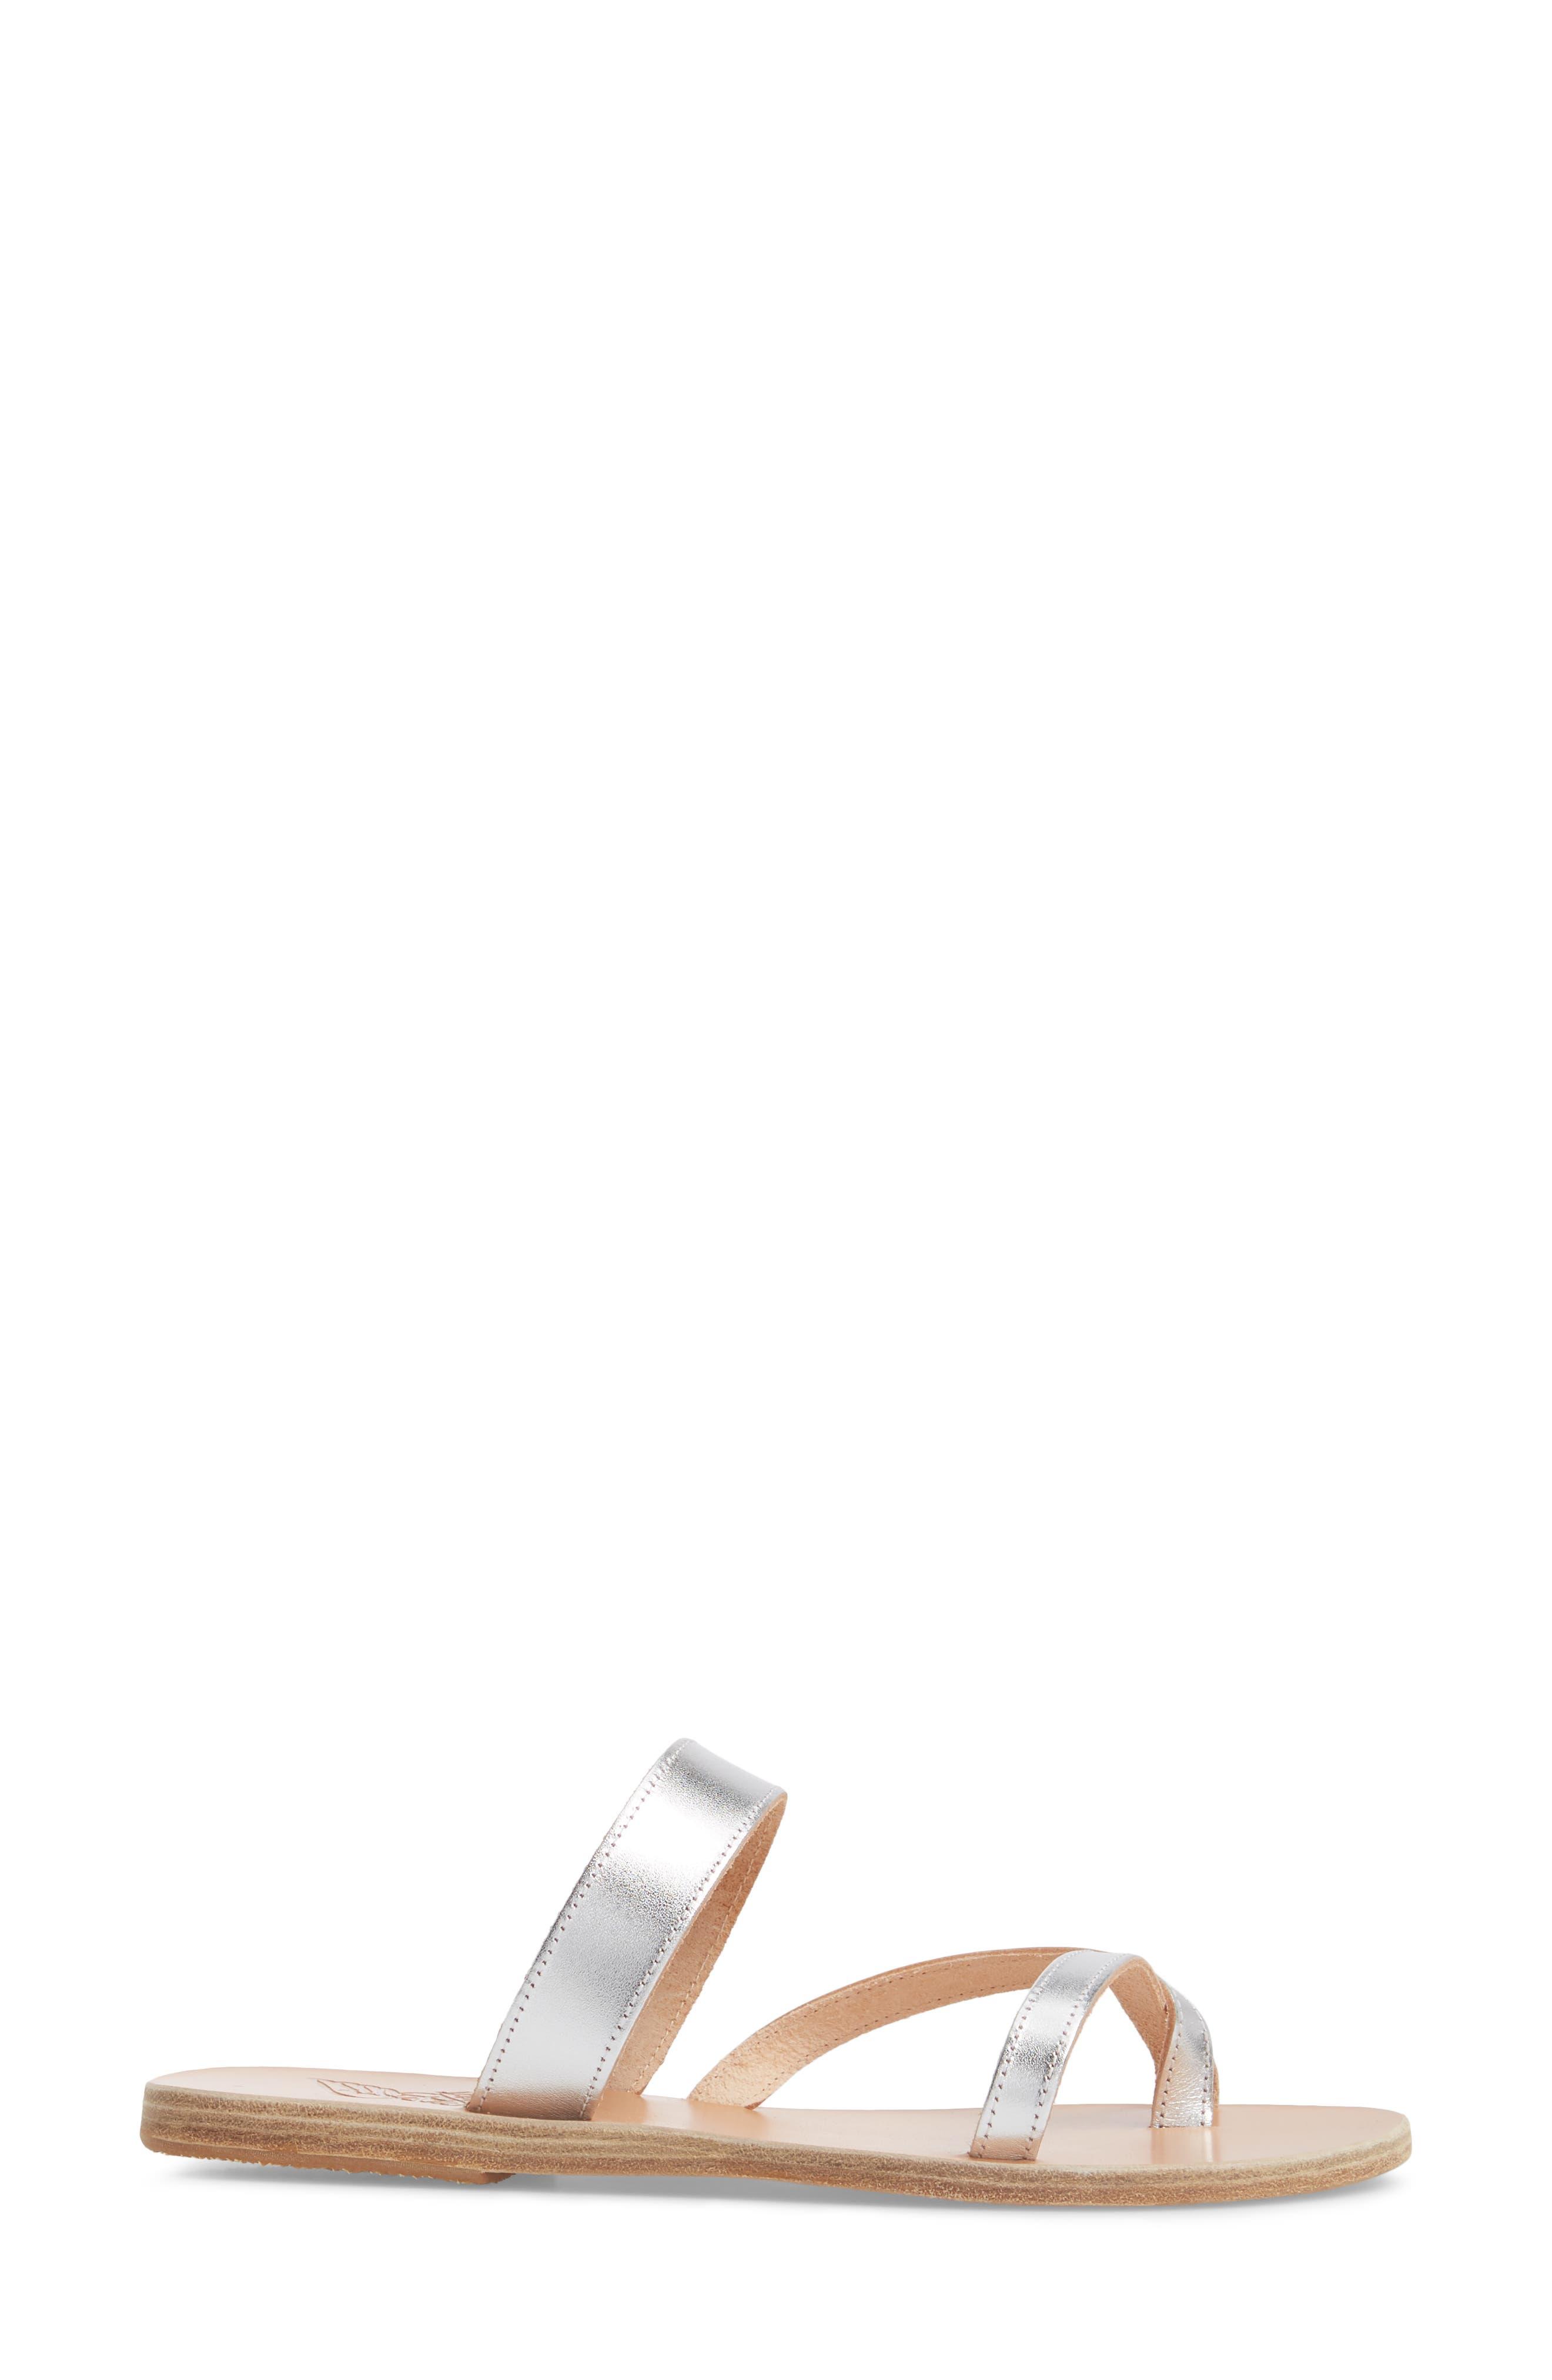 Daphnae Sandal,                             Alternate thumbnail 3, color,                             Silver